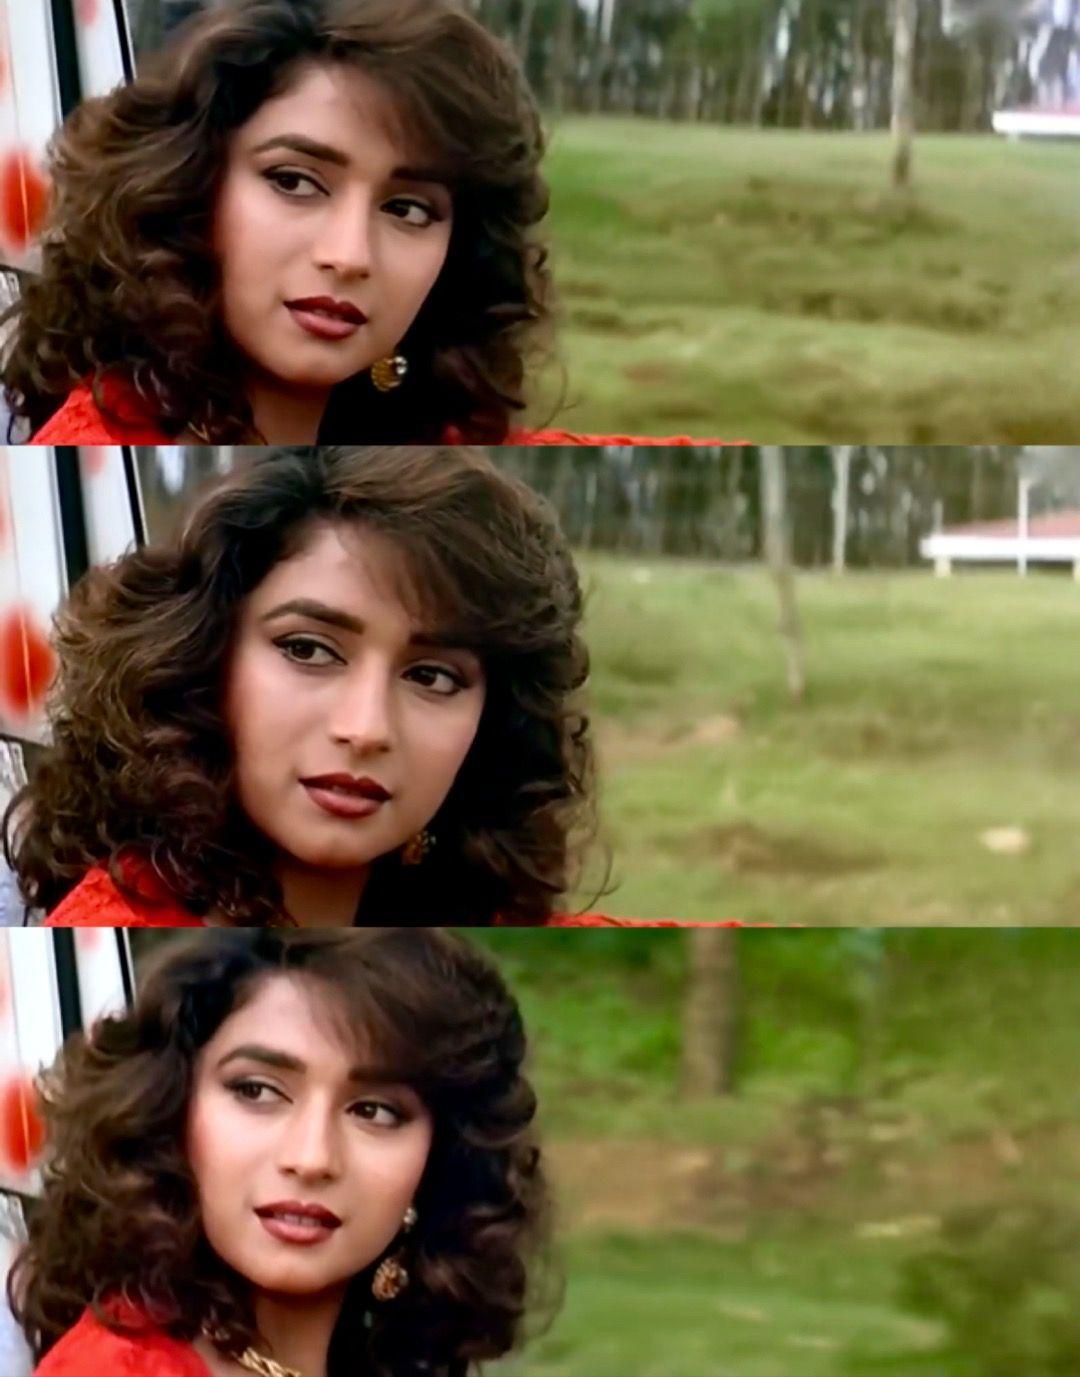 Madhuri Dixit in Hum Aapke Hain Kaun (With images) | Bollywood ...